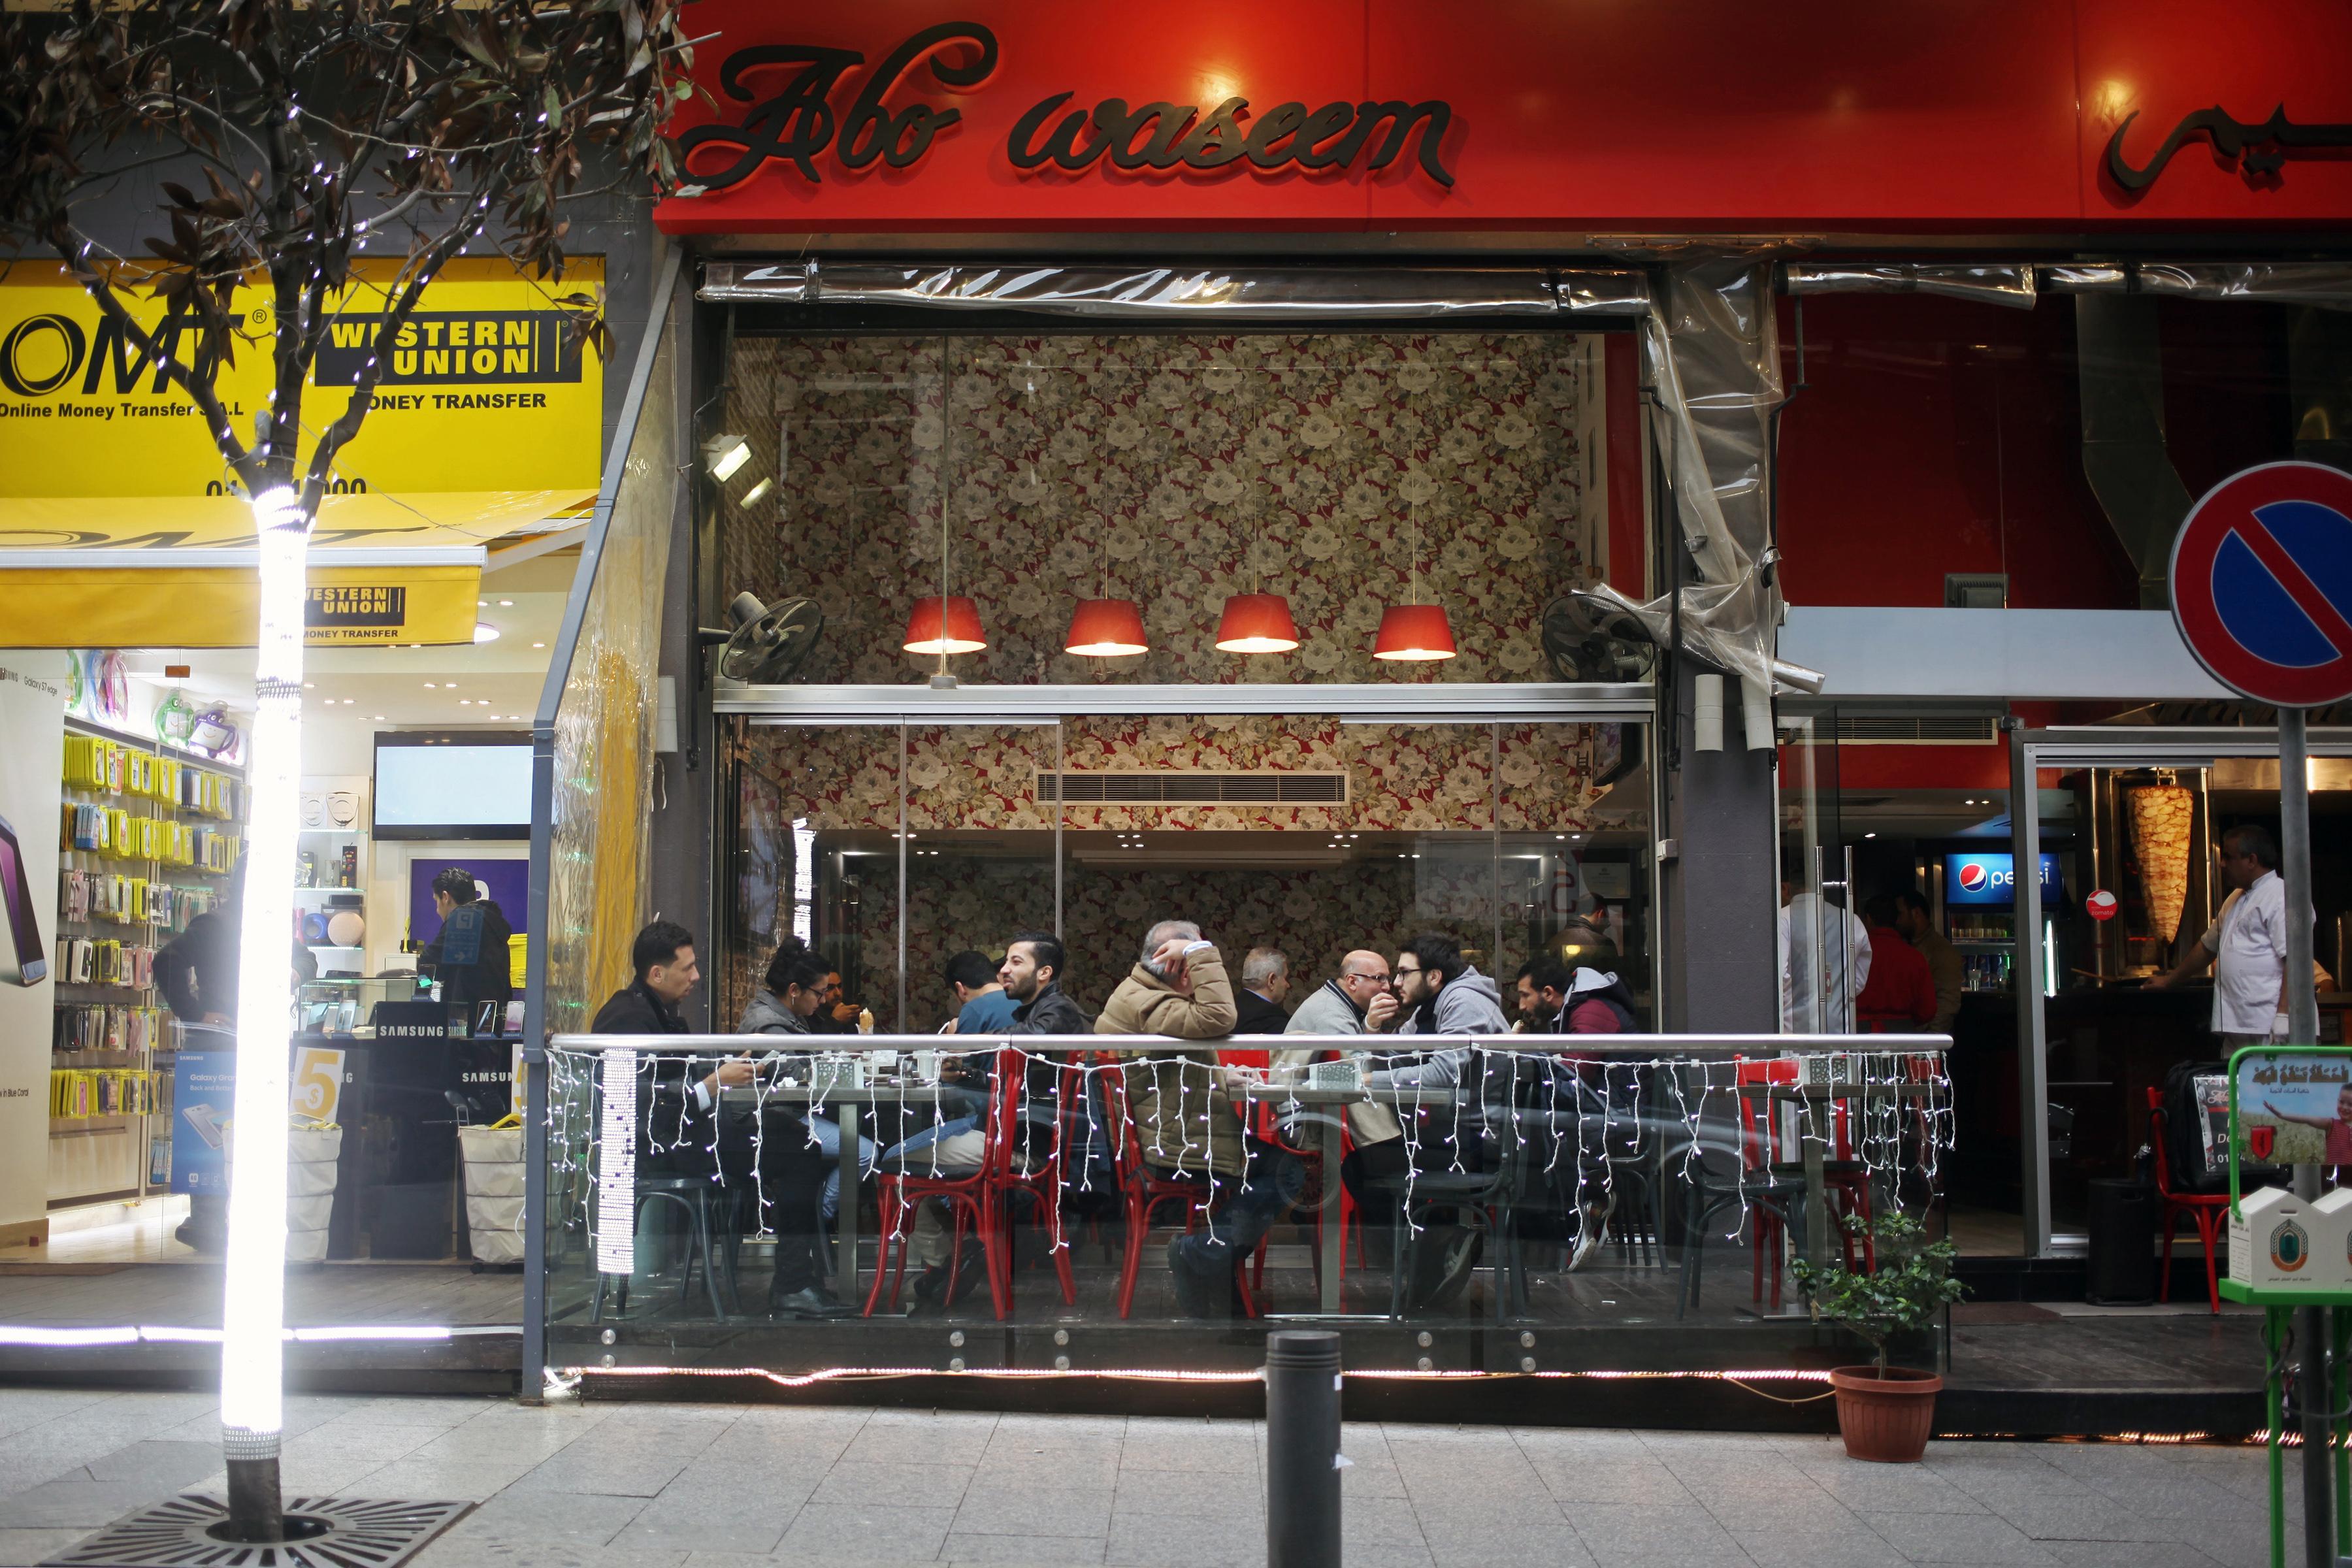 Abu Waseem's restaurant on Hamra street in Beirut.